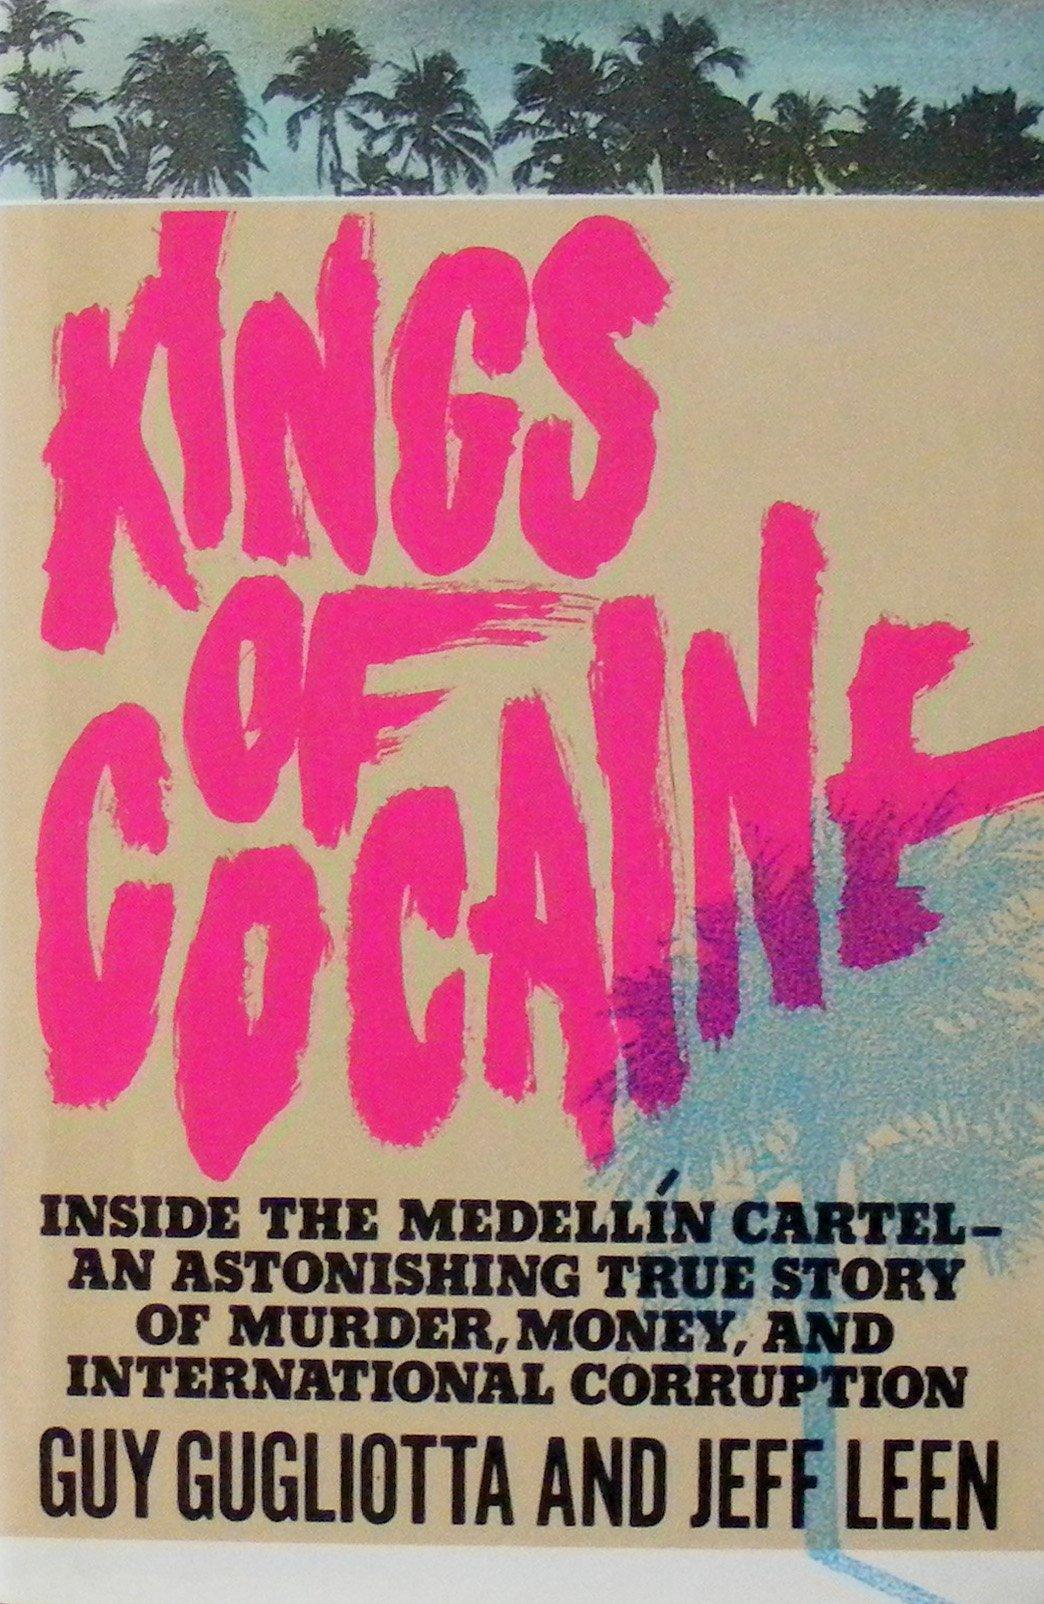 Kings of Cocaine Inside the Medellin Cartel an Astonishing ...